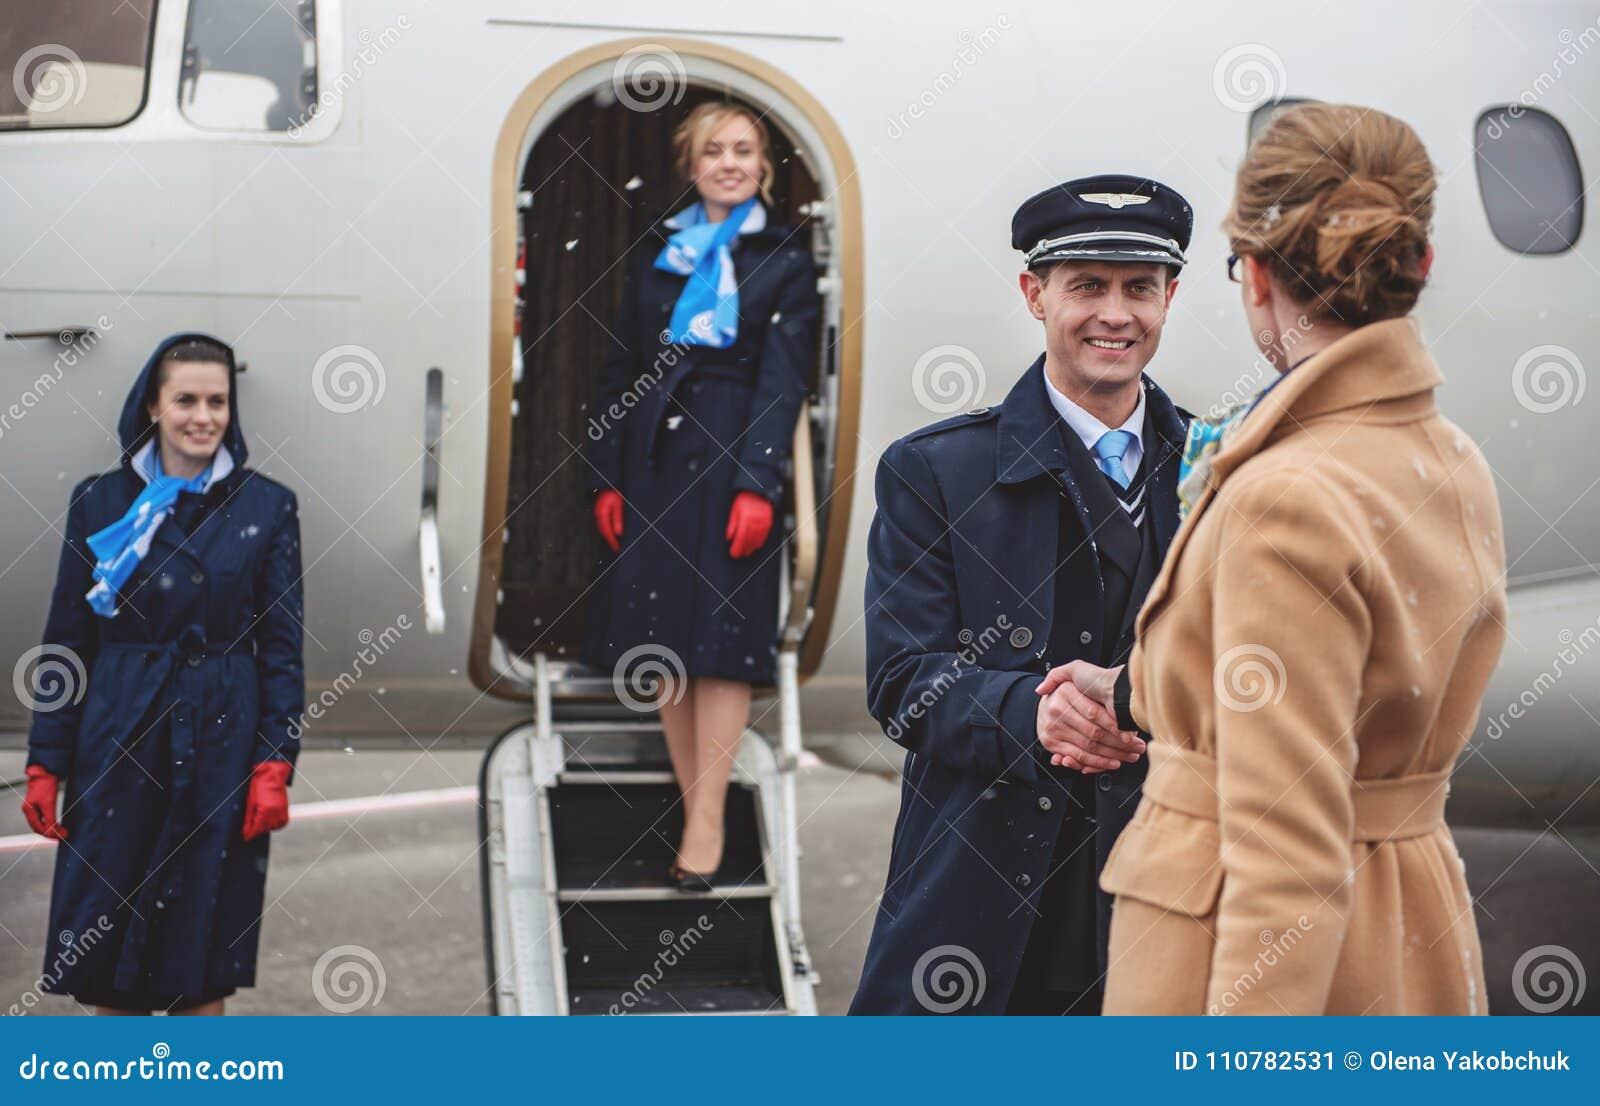 Salutation pilote sortante avec la femelle